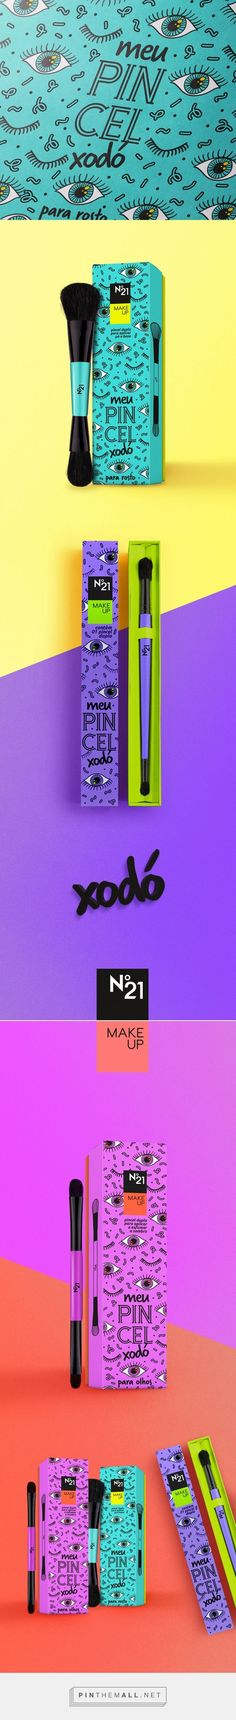 Perfectly done branding, packaging, and styling. Meu Pincel Xodó • N°21 make up brushes by Carmelita Design, Lucianne Loureiro Weigert